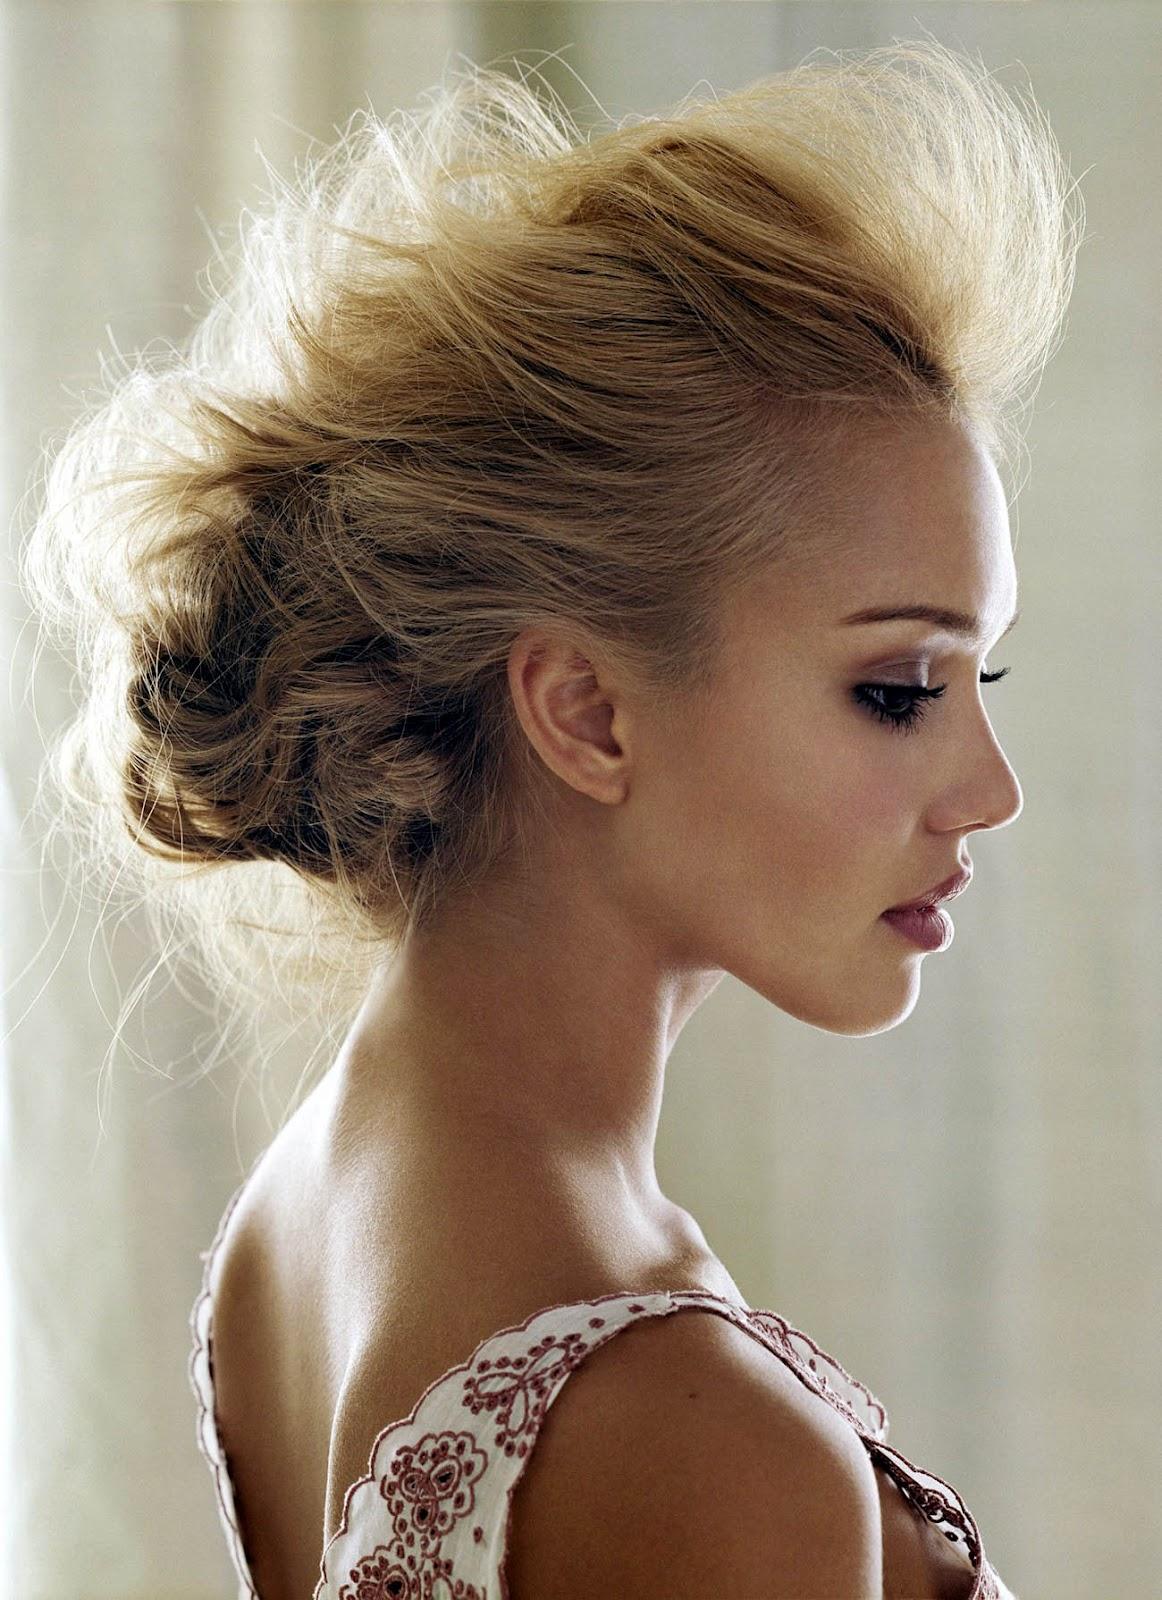 Beautiful Fun Fall Wedding Inspiration: Bollywood Actress World (Original): Jessica Alba Stunning